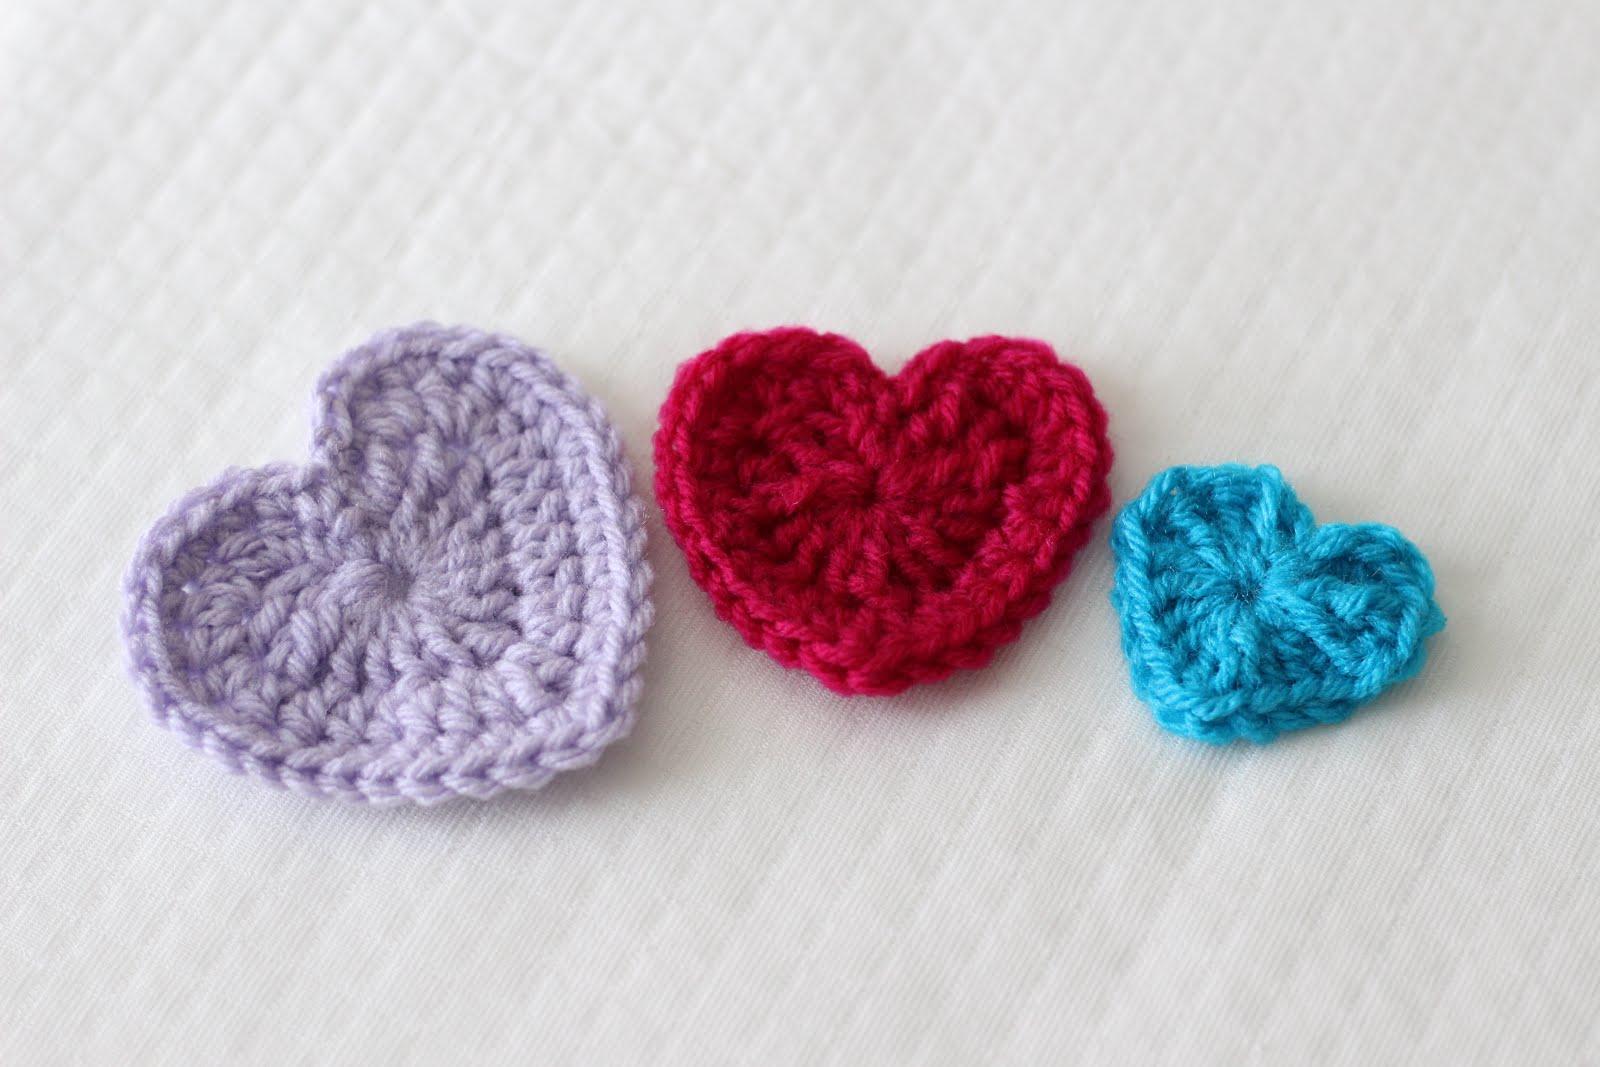 Easy Crochet Hearts - 3 Sizes - Sewrella